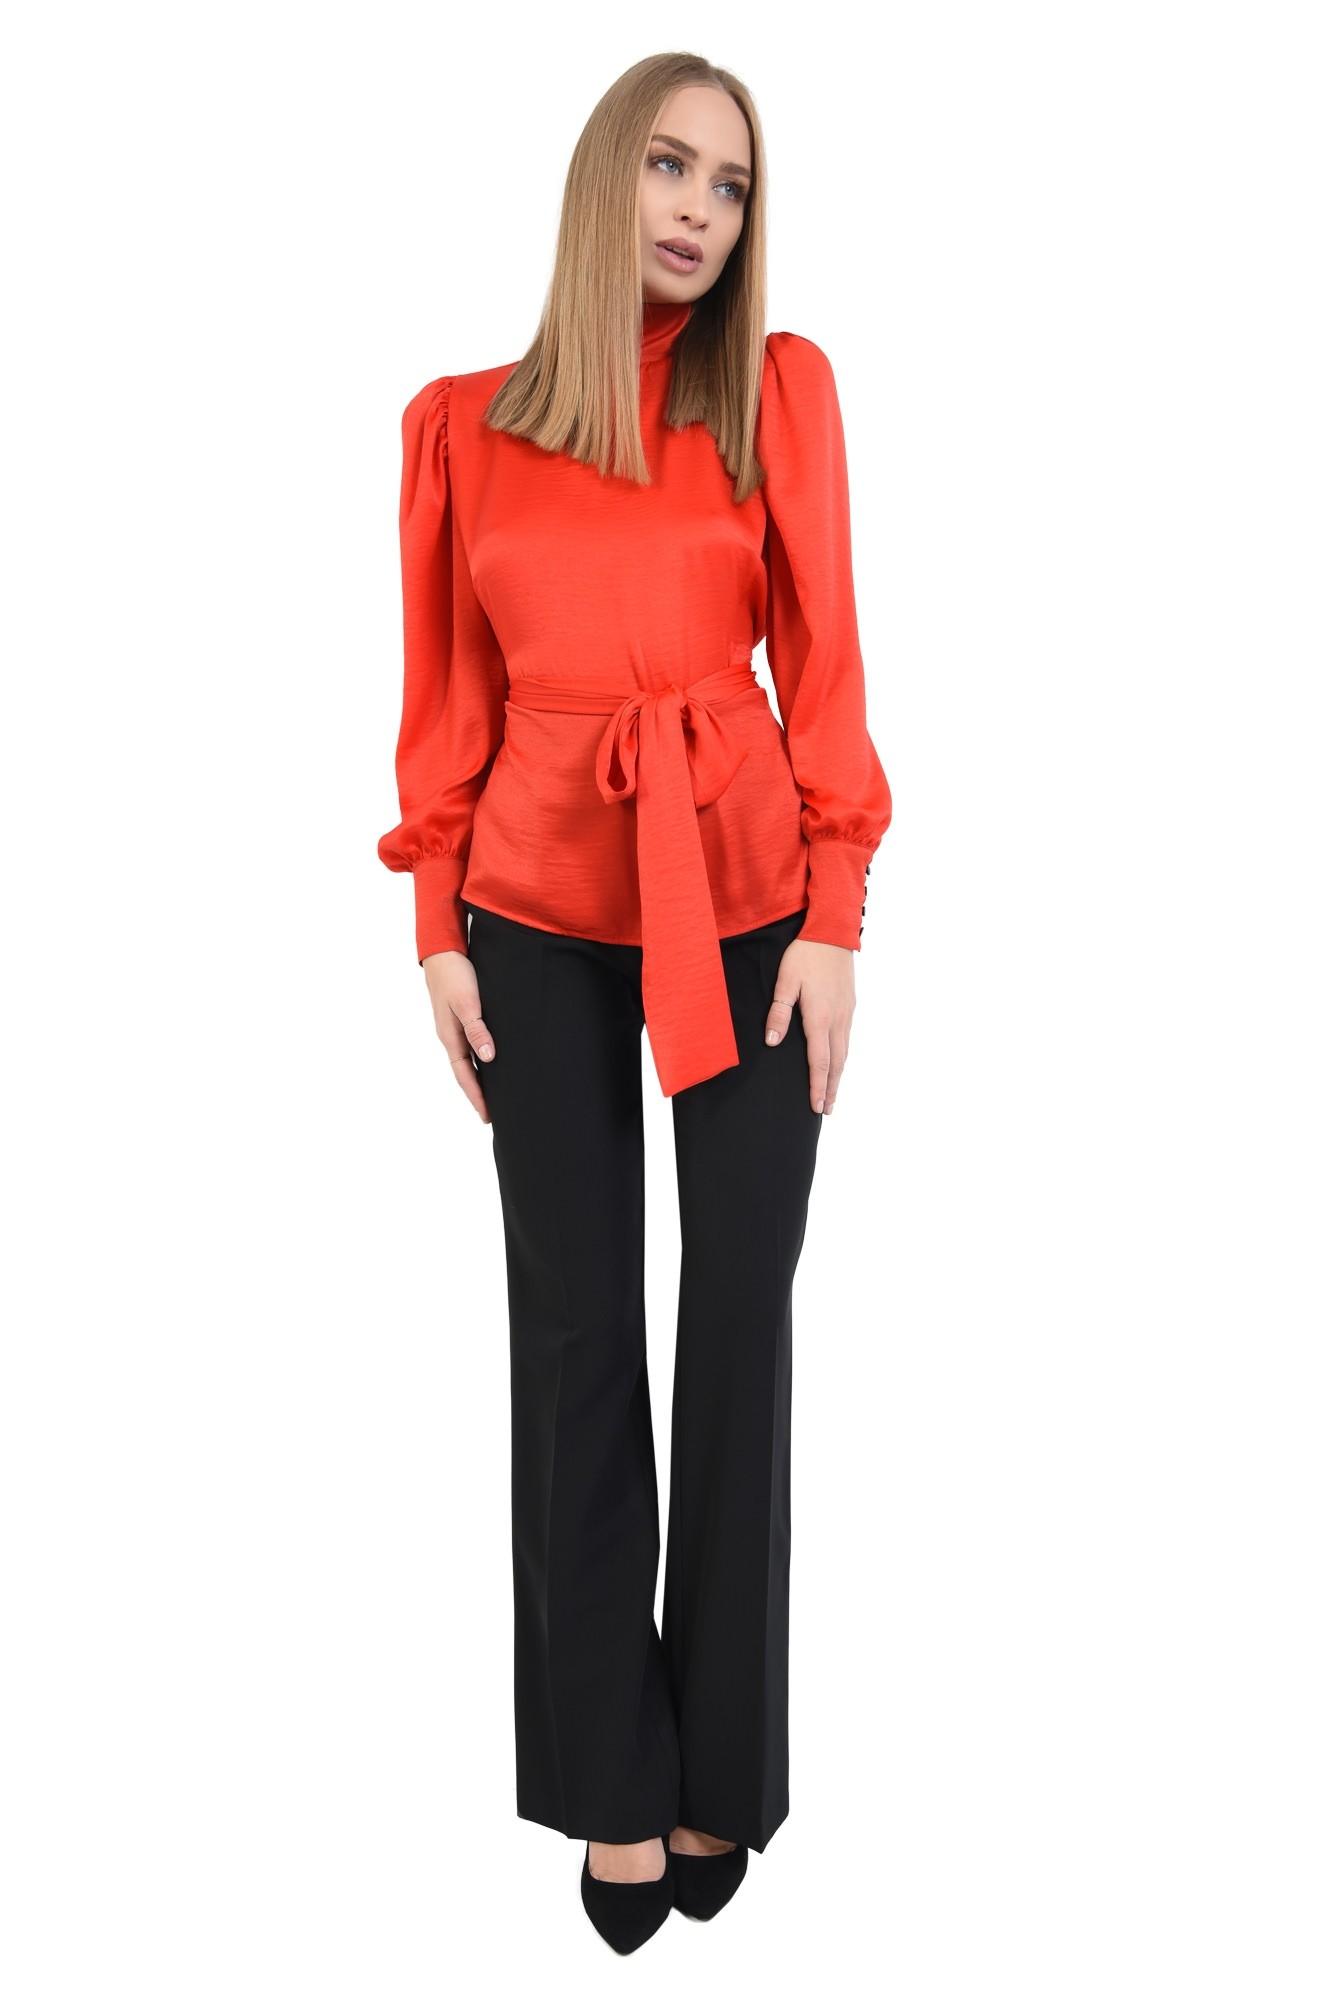 360 - bluza de ocazie, rosu, cu funda, cu maneci lungi